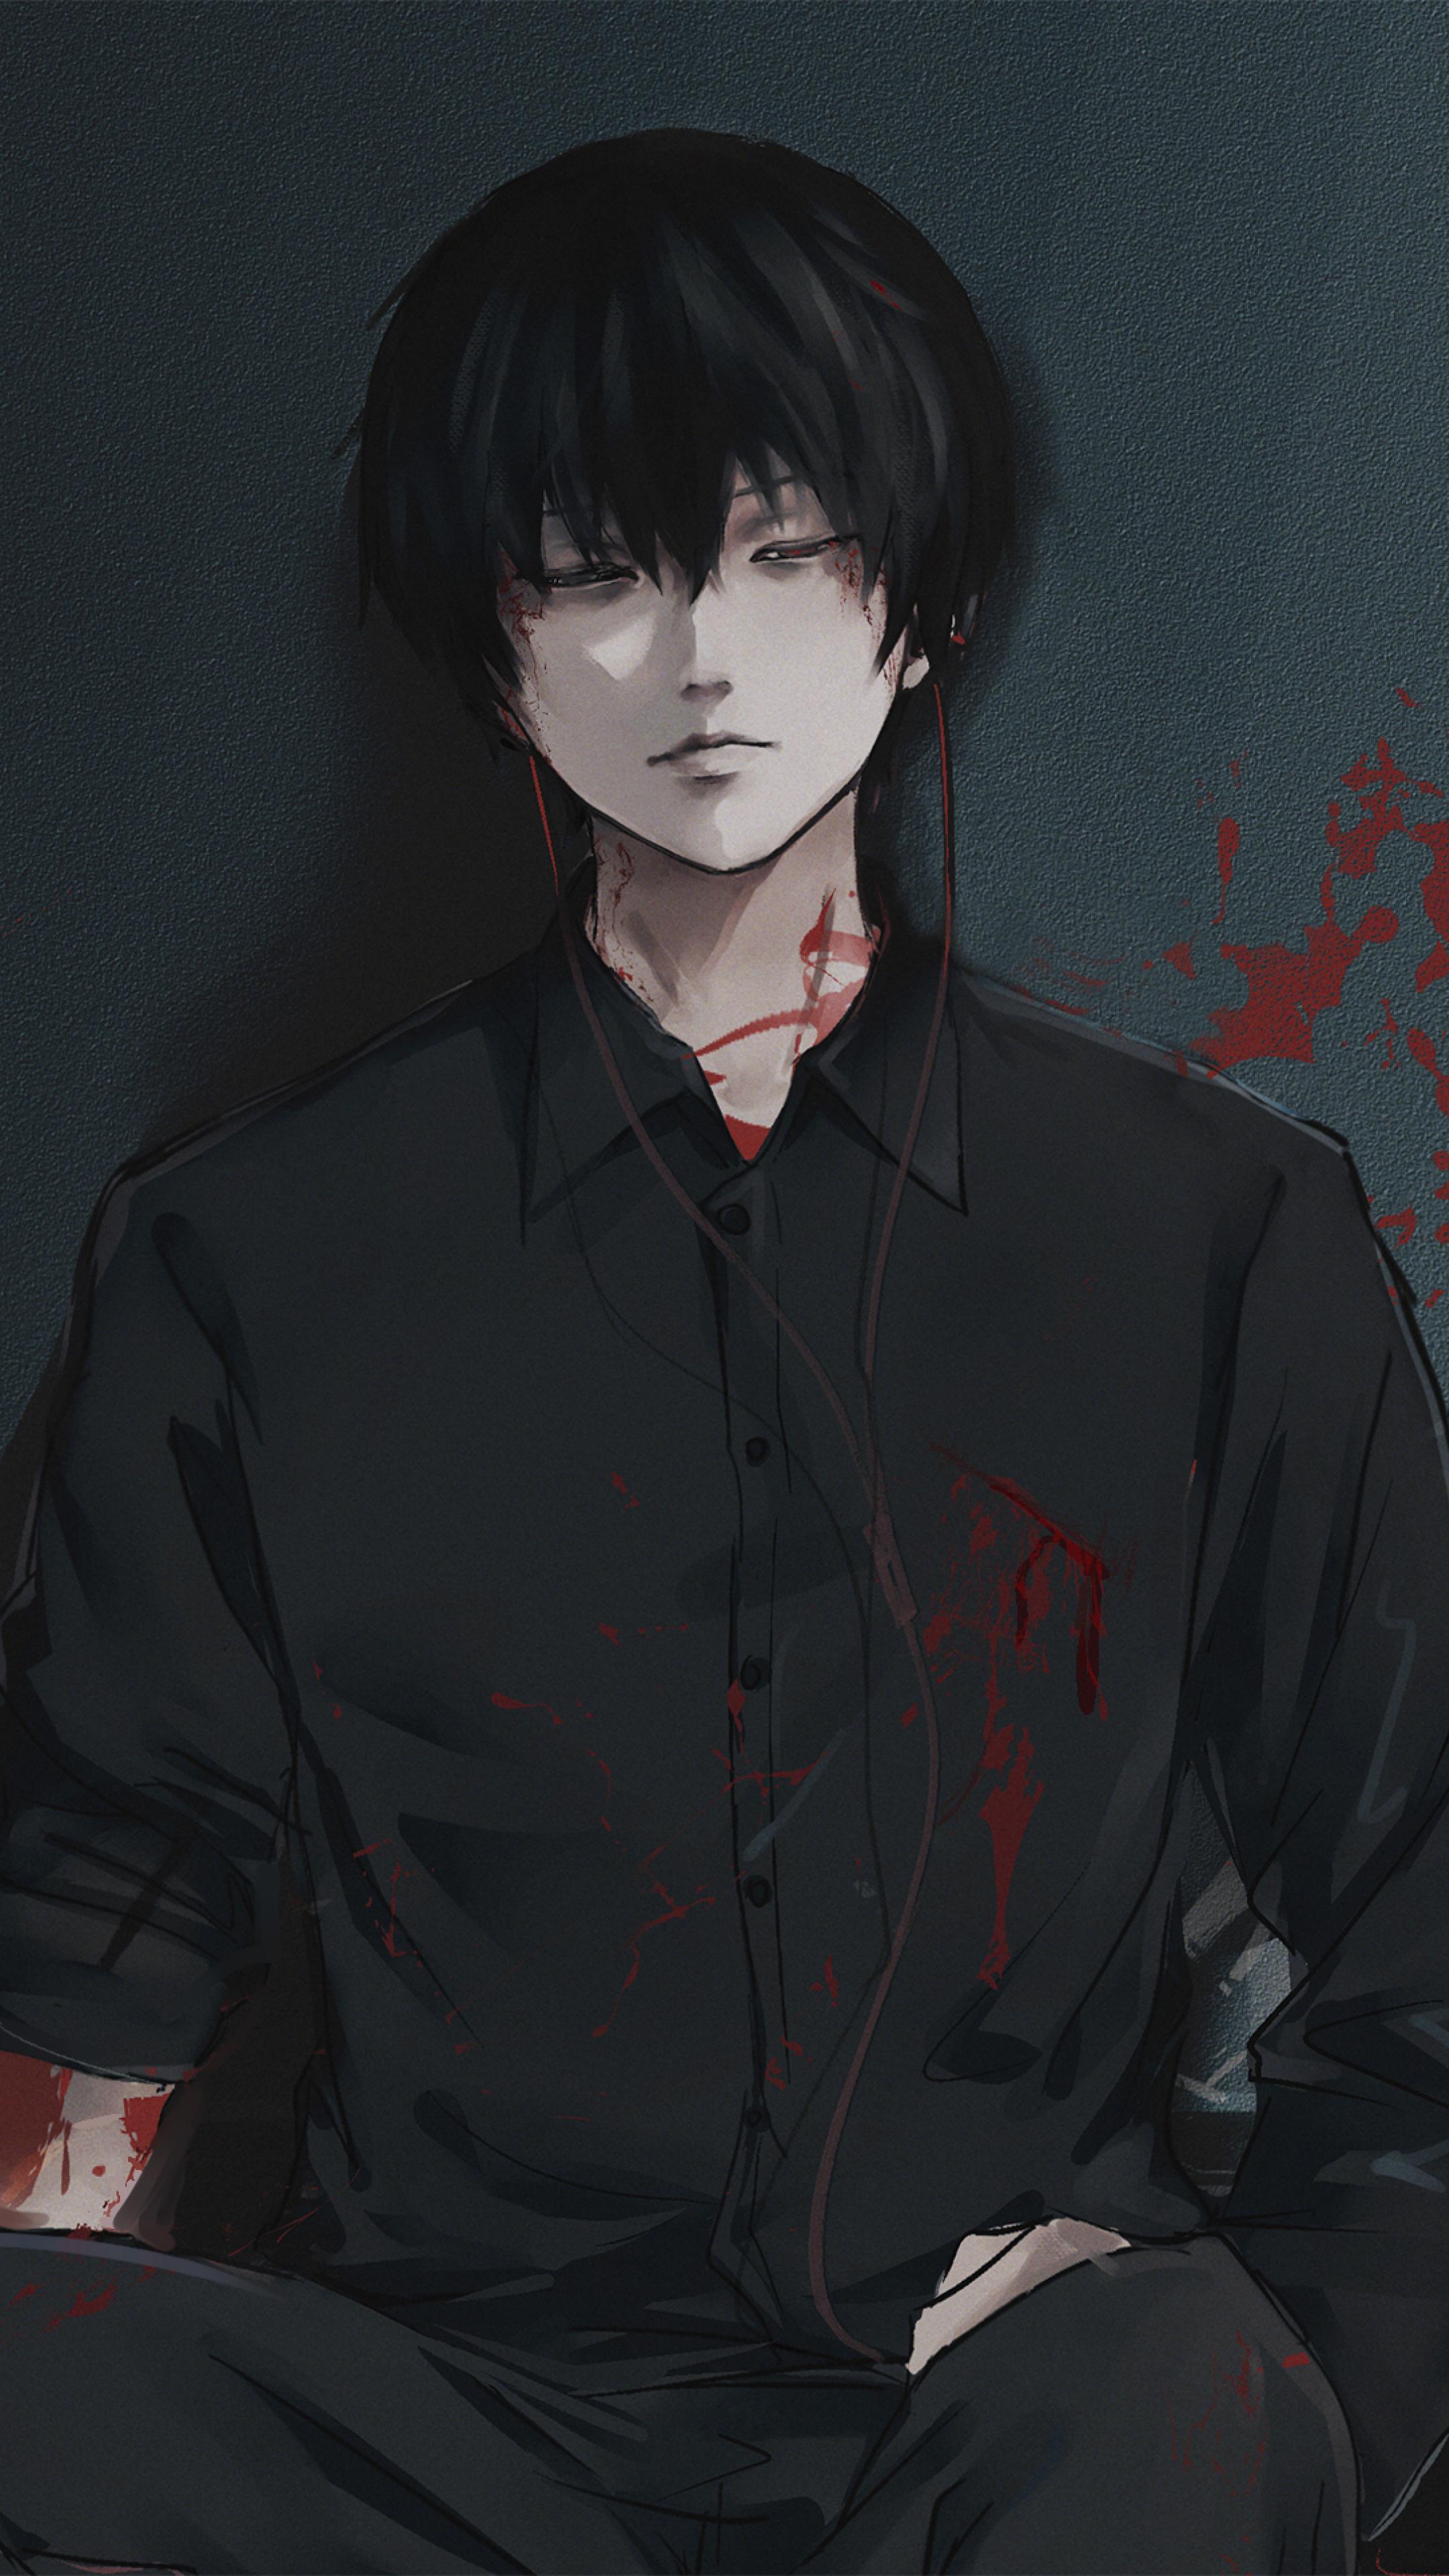 Ken Kaneki From Tokyo Ghoul Wallpaper in 2160x3840 Resolution